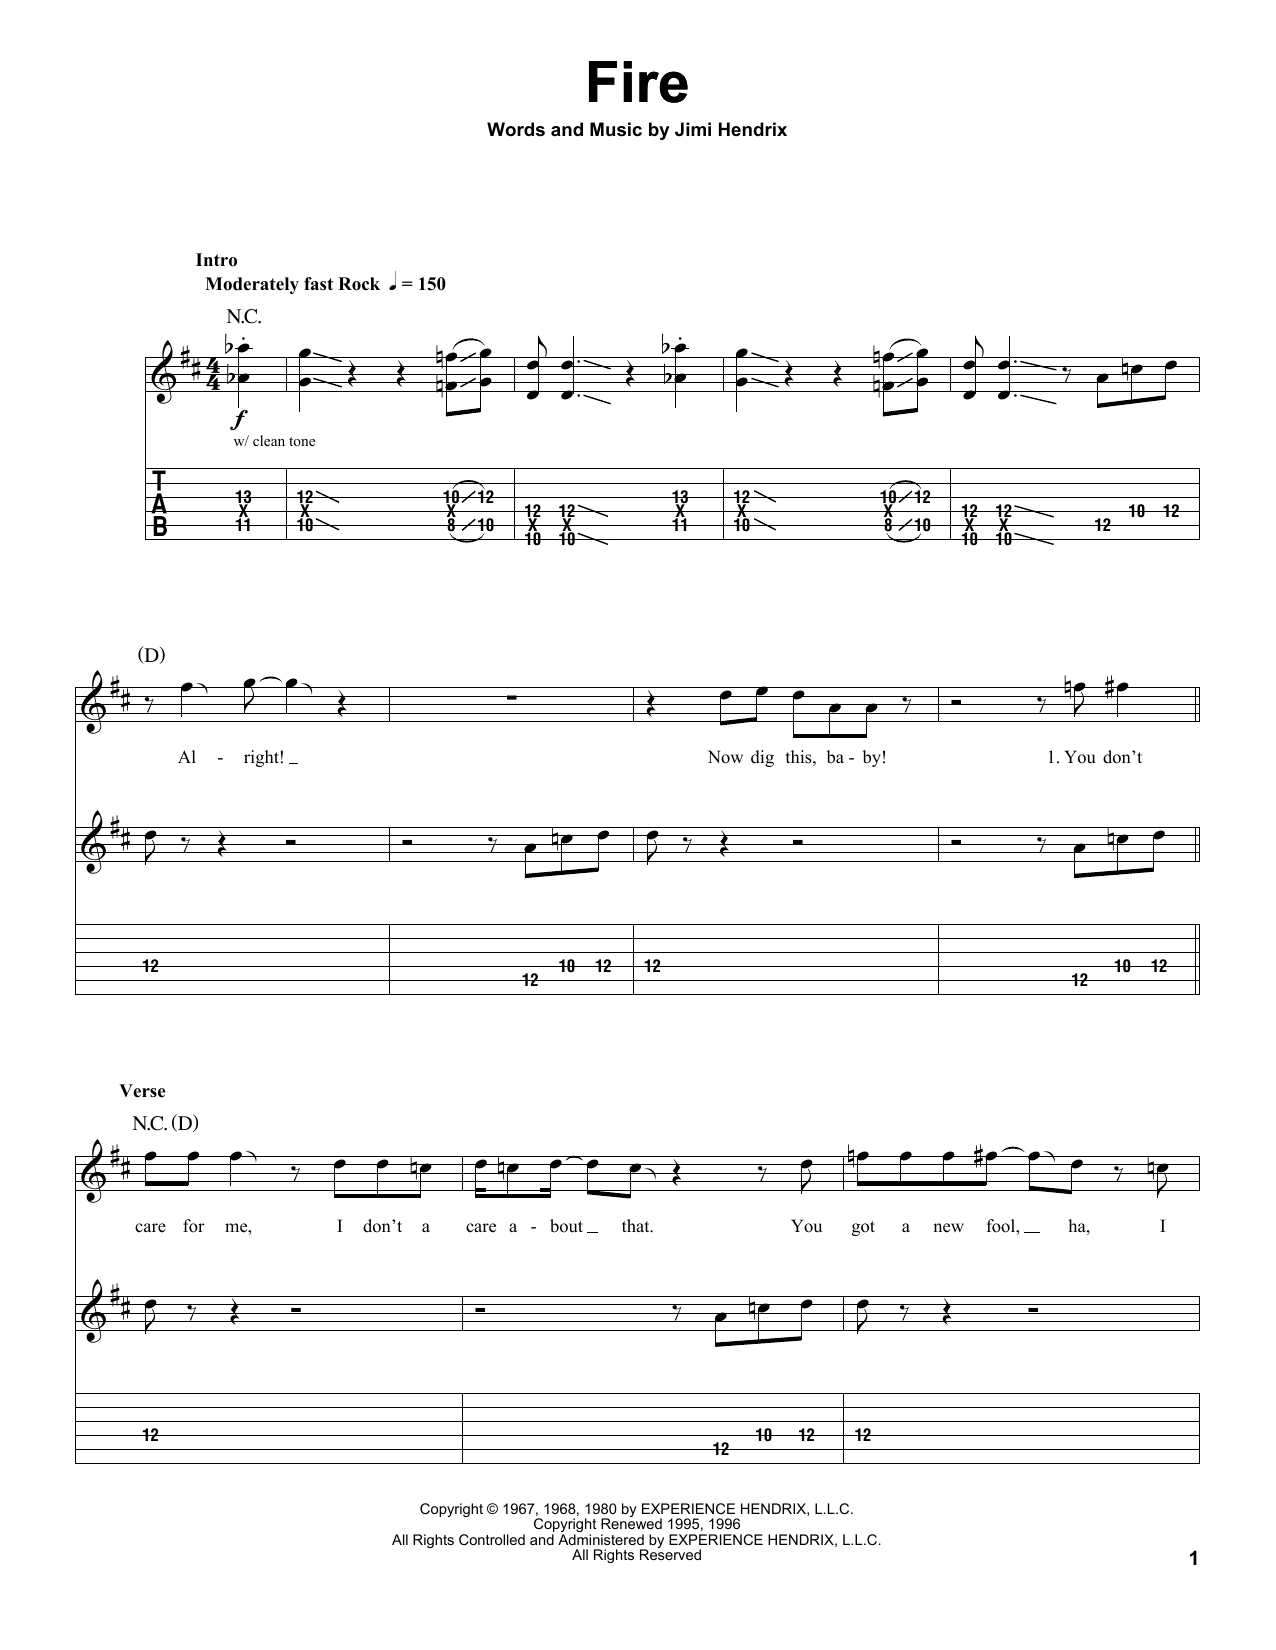 Jimi Hendrix Fire Sheet Music Notes Chords Printable R B